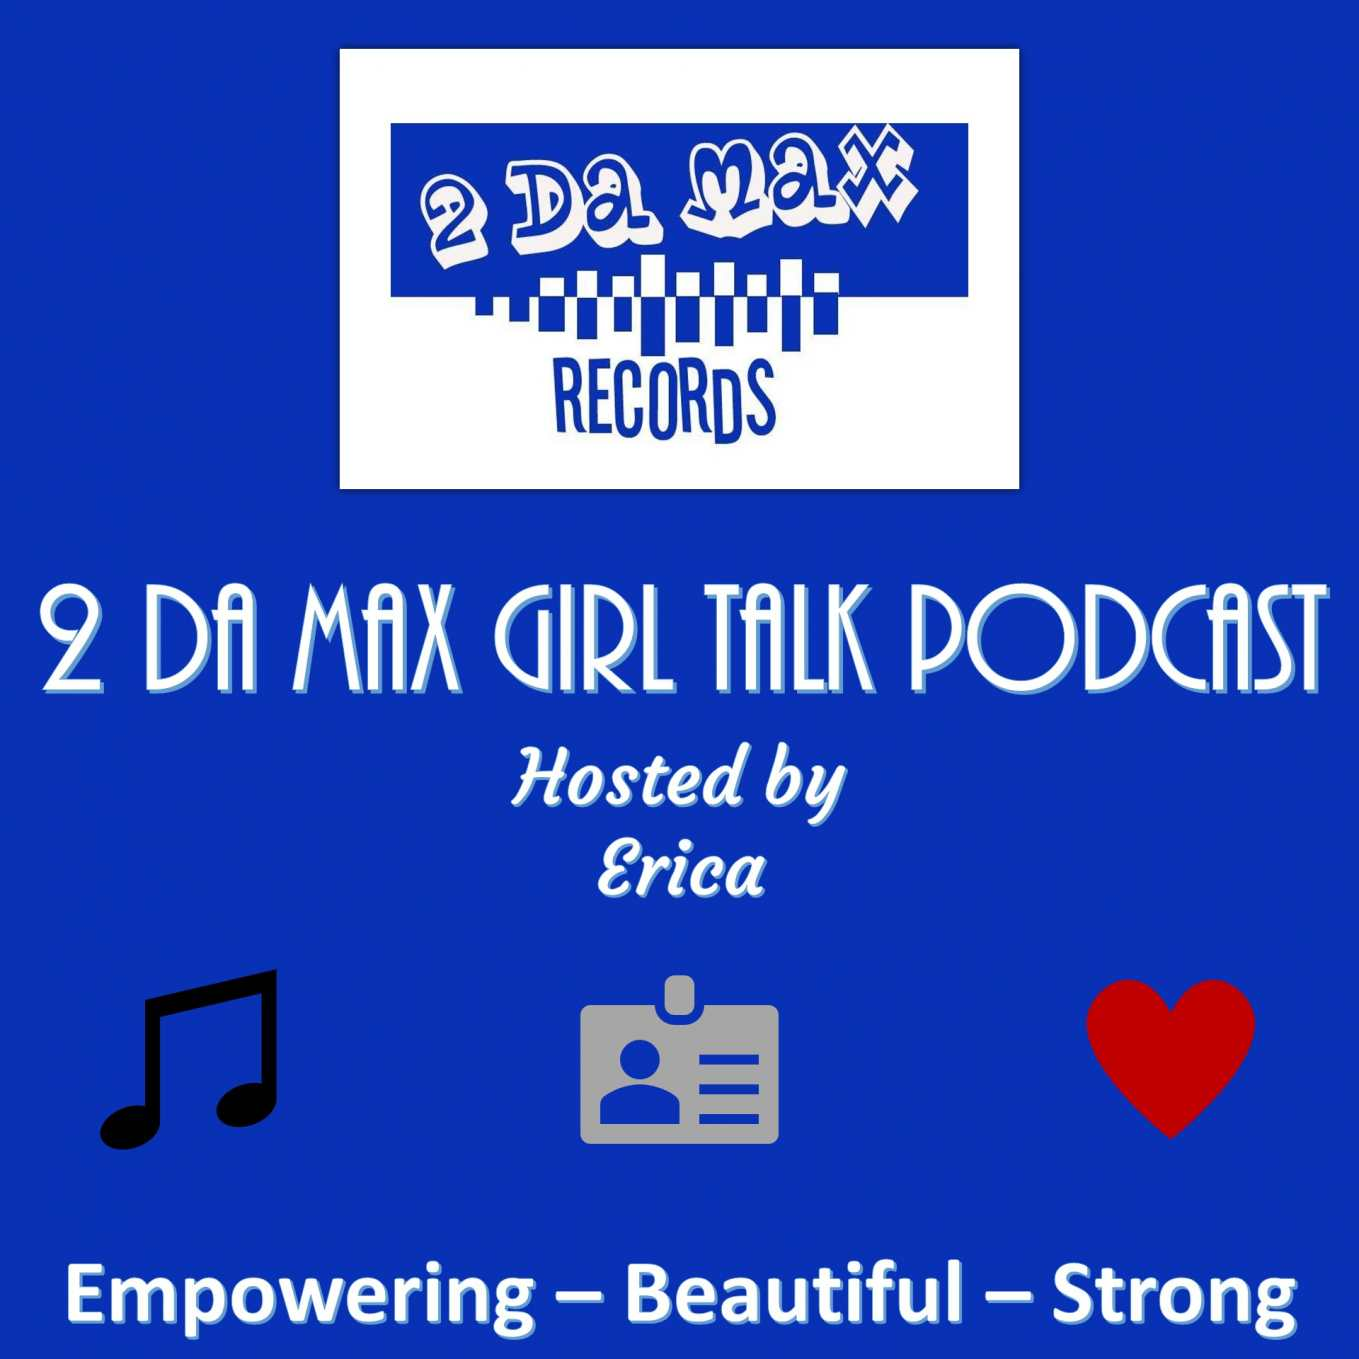 2 Da Max Girl Talk Podcast